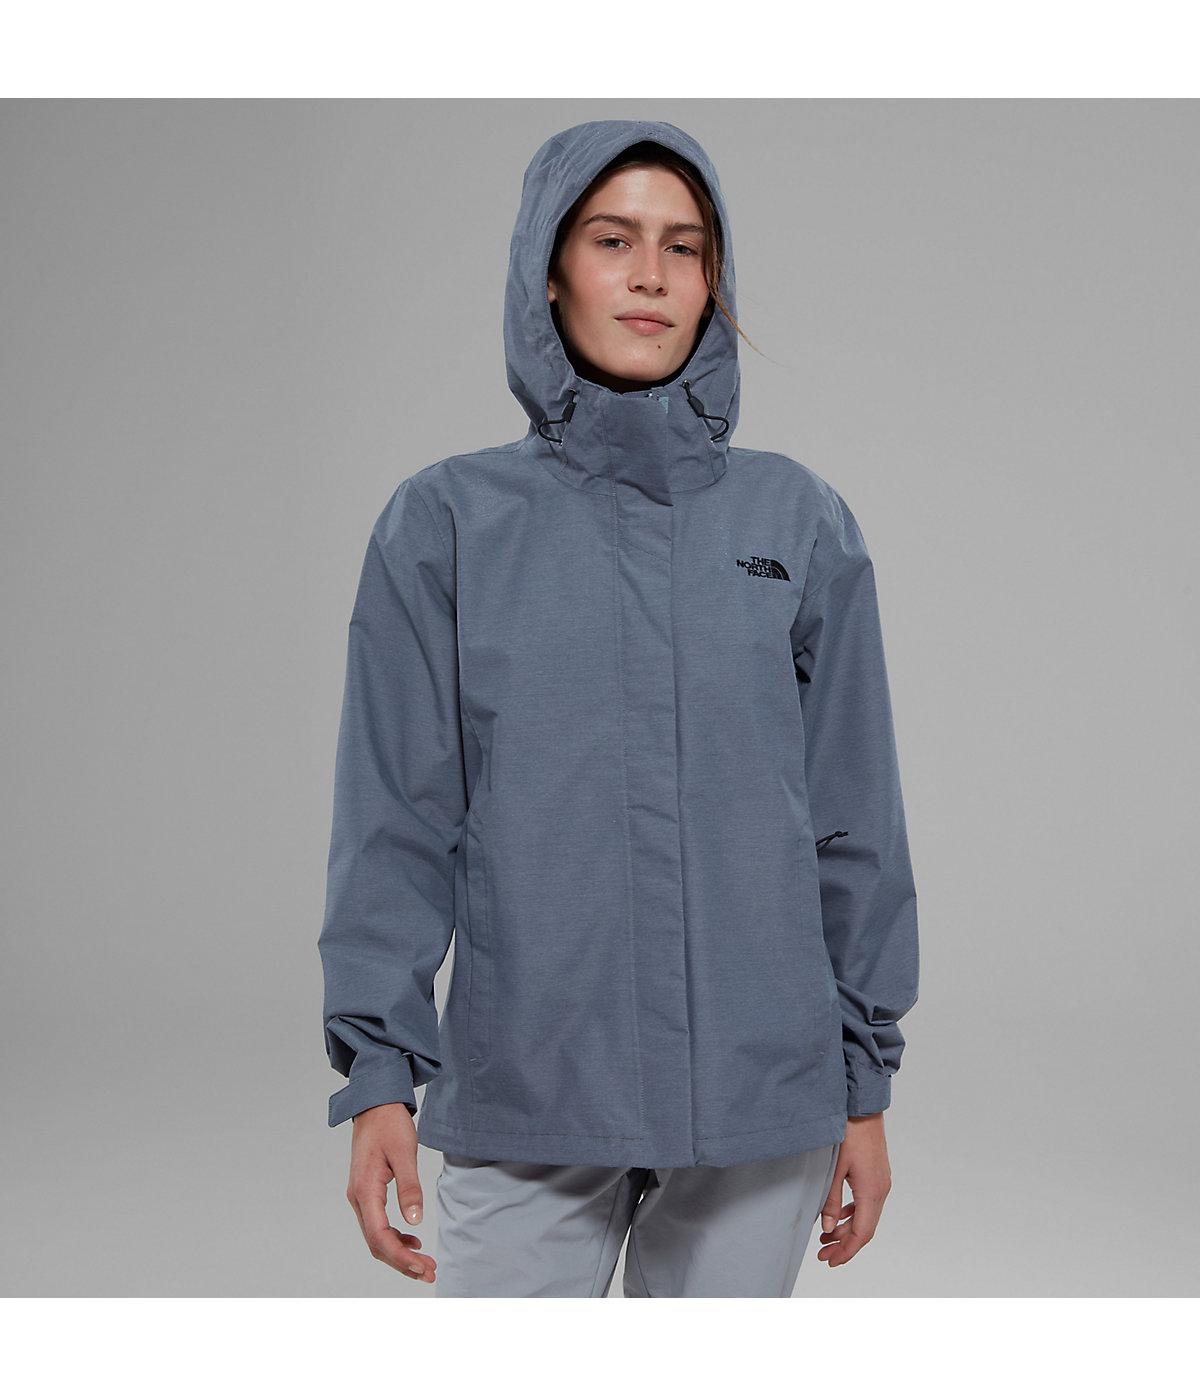 Куртка The North Face Venture 2 женская